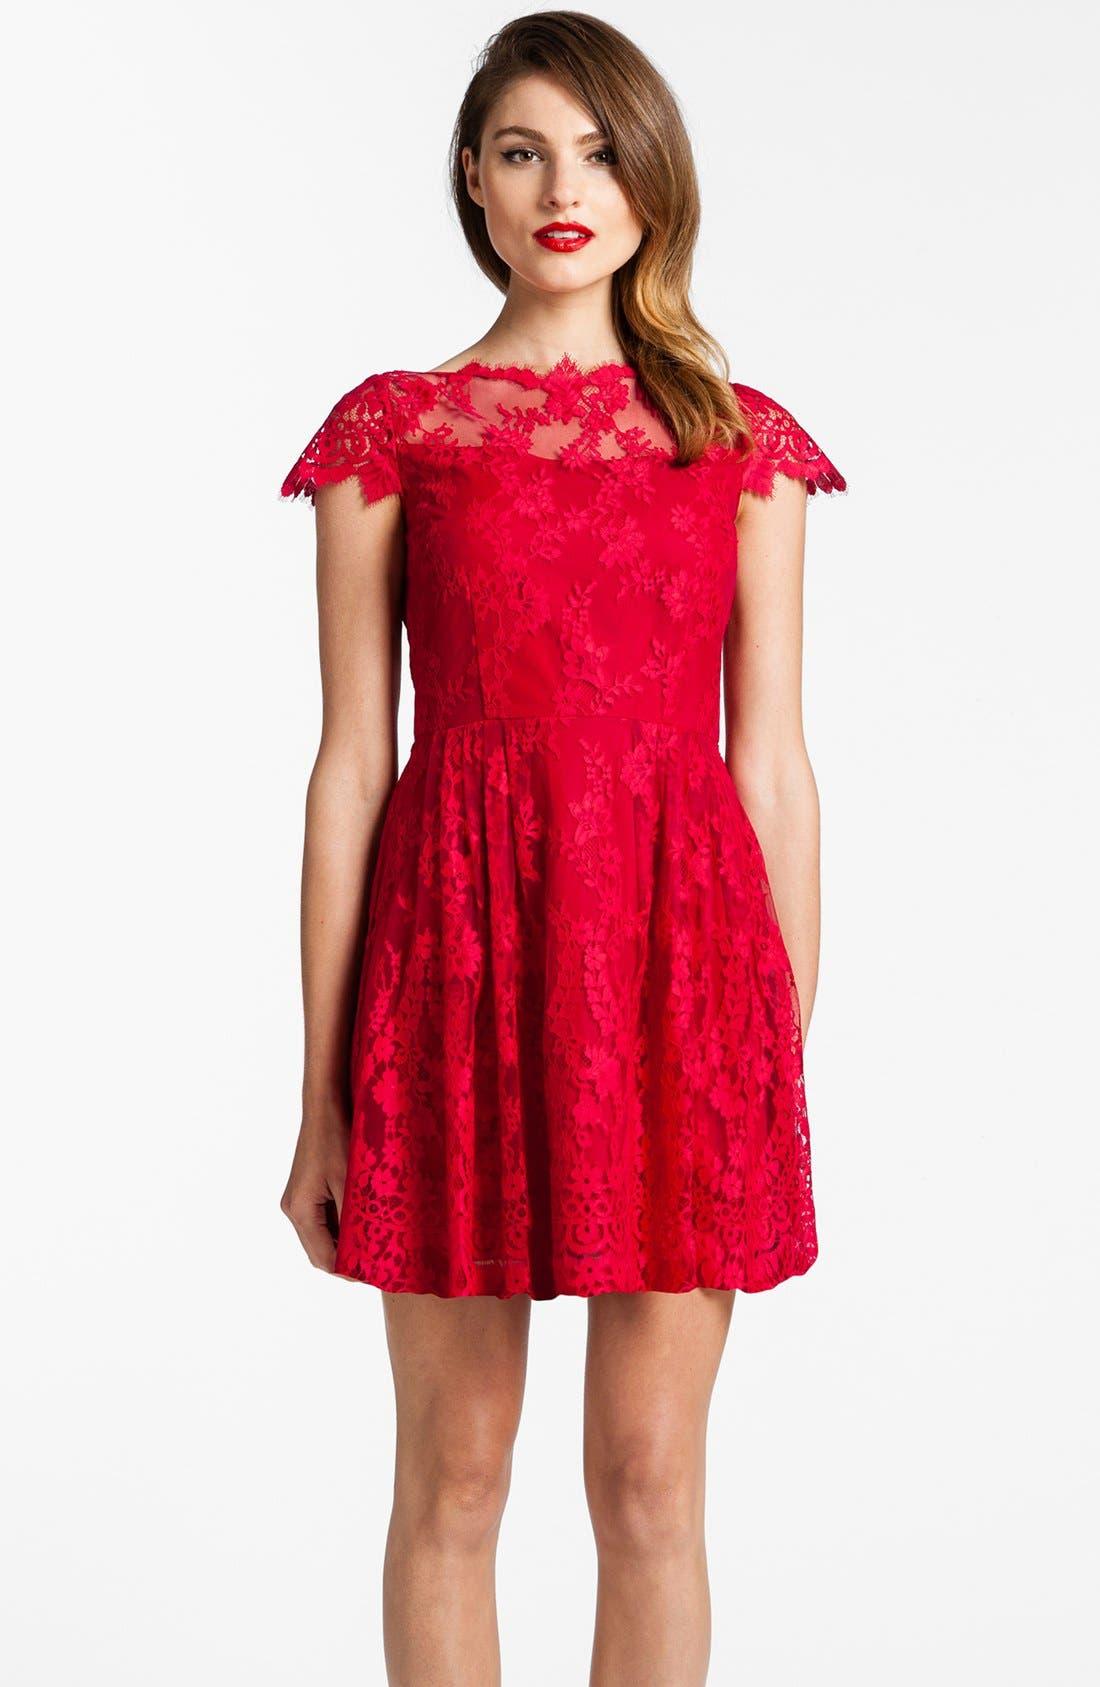 Alternate Image 1 Selected - Cynthia Steffe Illusion Yoke Lace Fit & Flare Dress